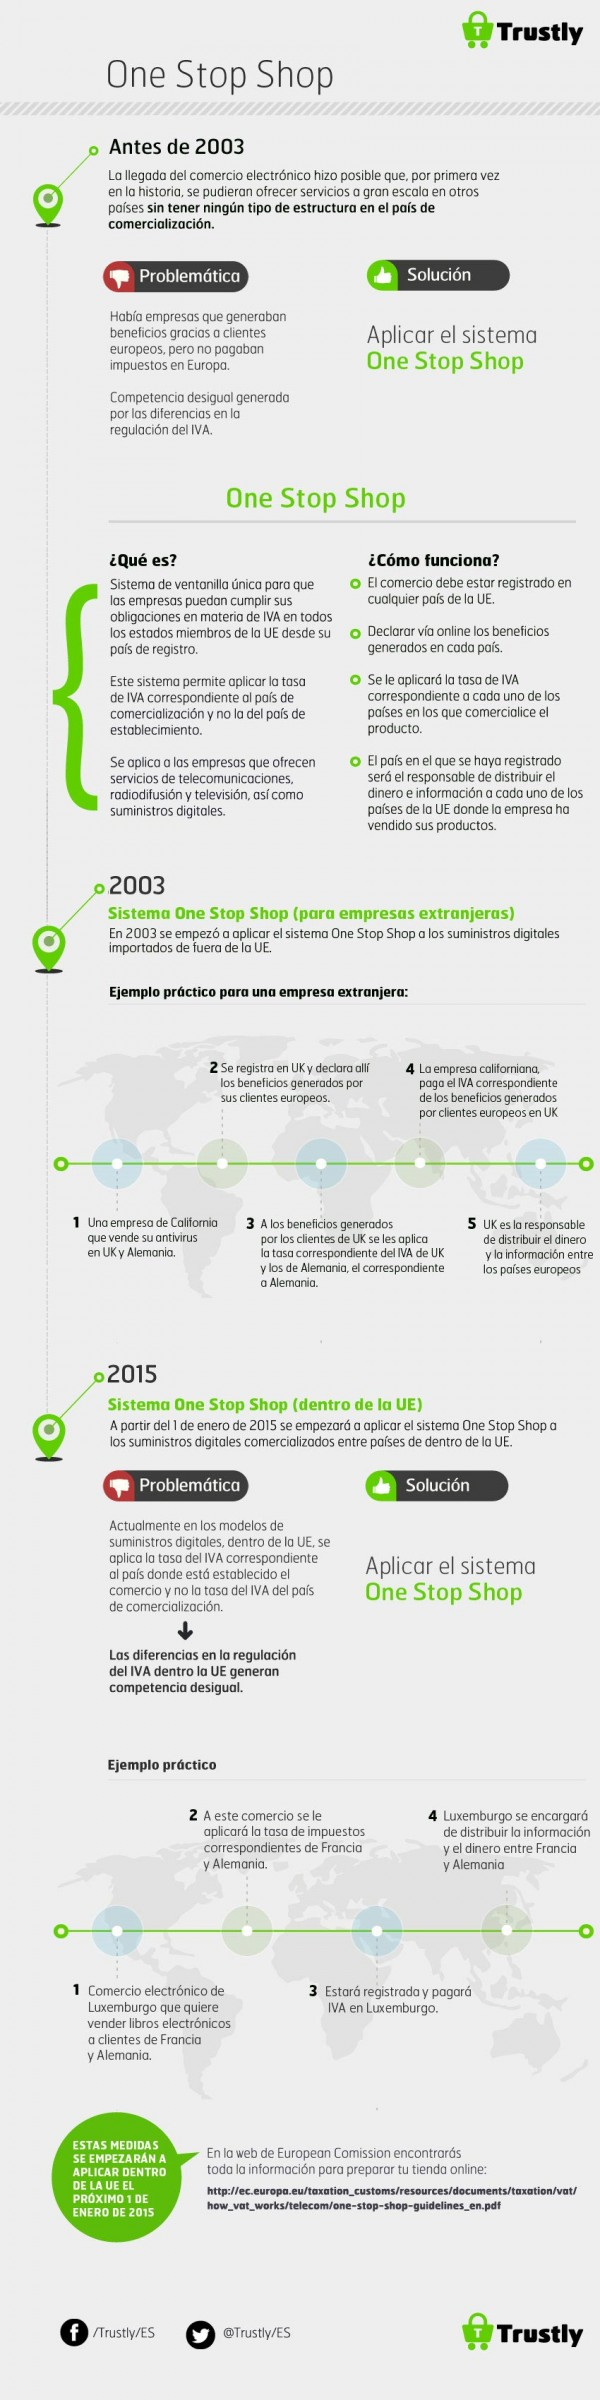 OneStopShop-Trustly